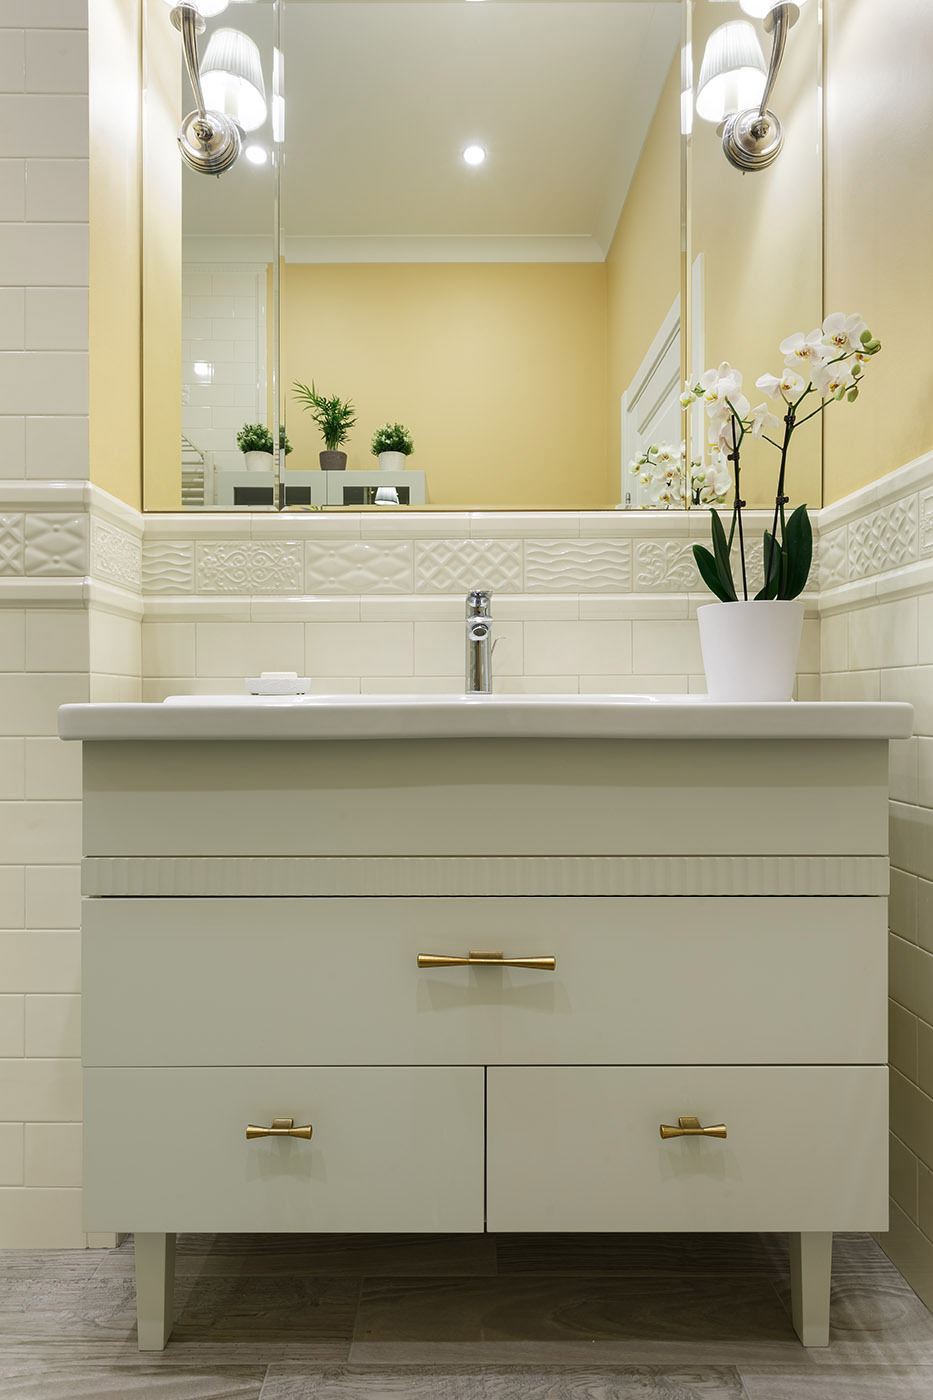 интерьер ванной комнаты 4 кв м